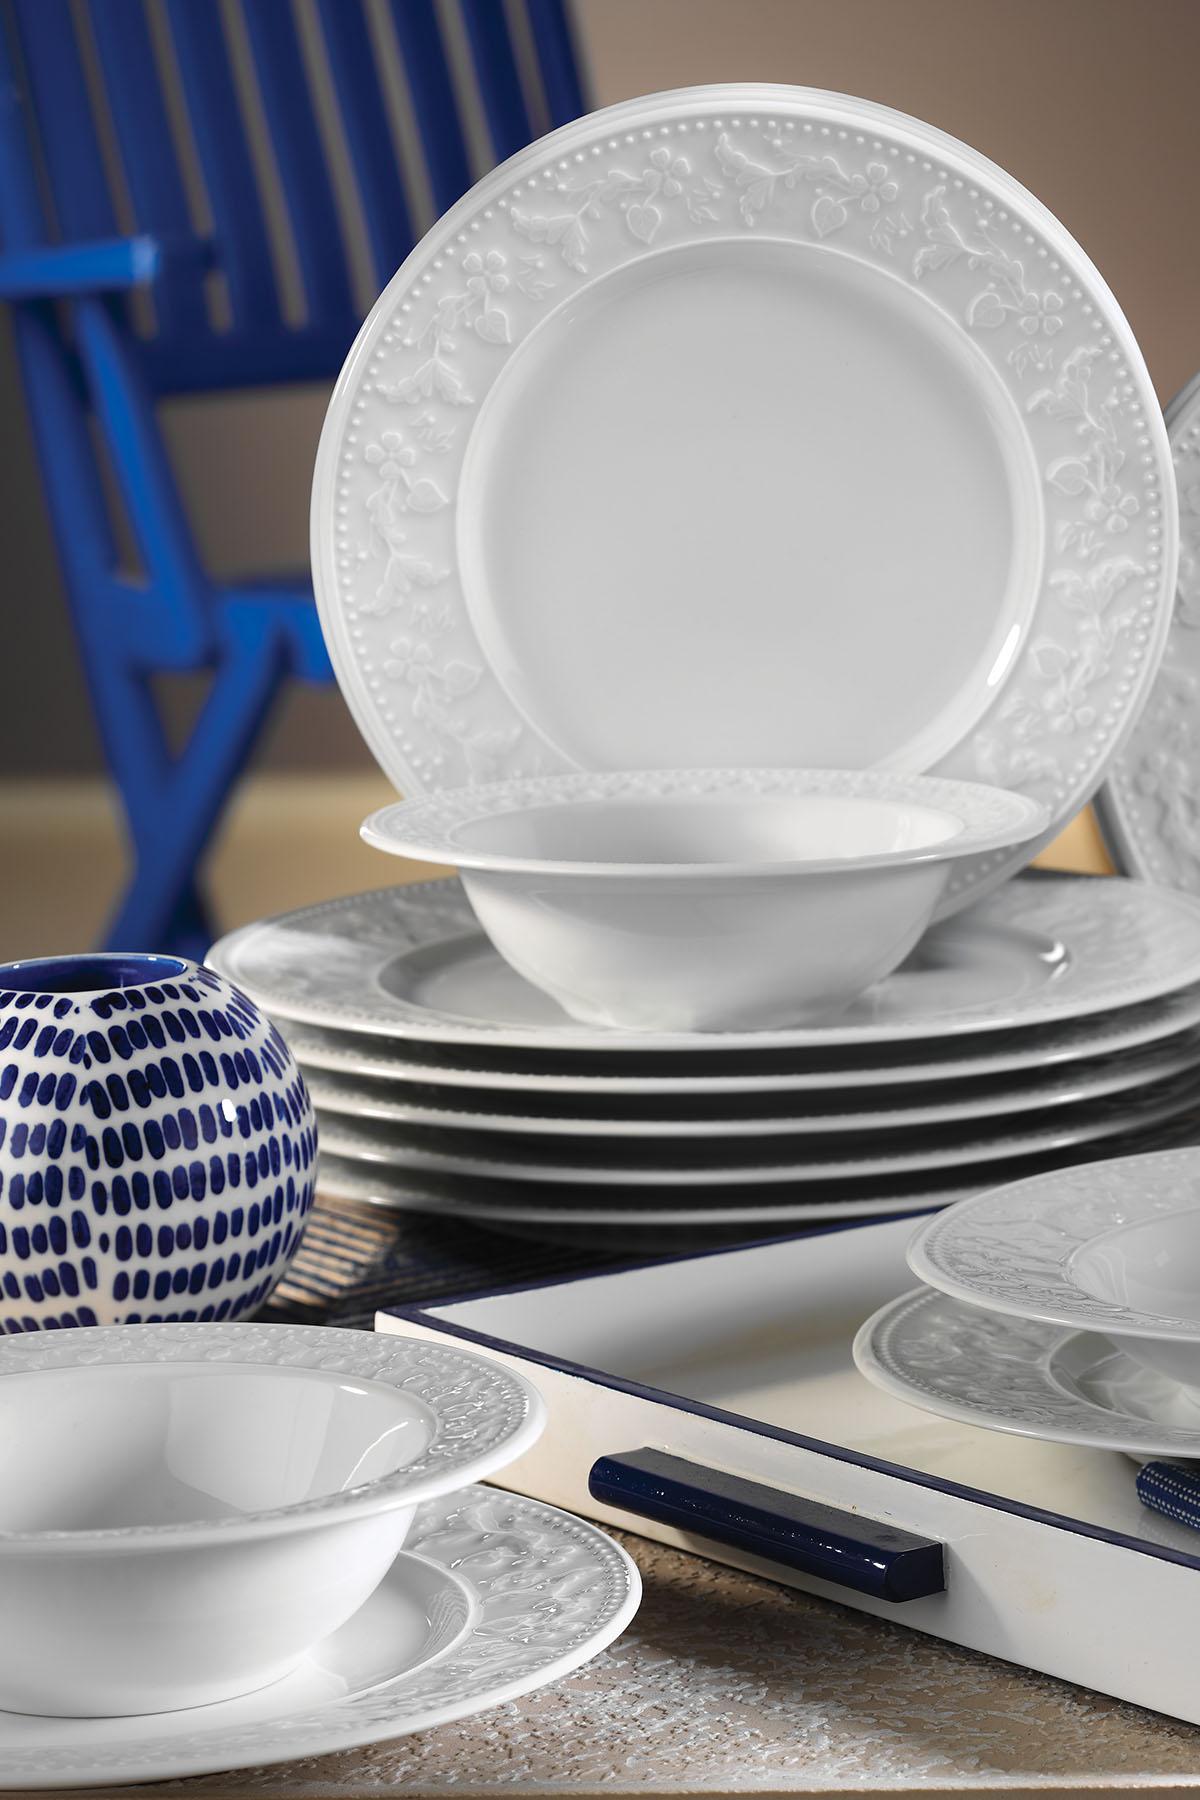 MITTERTEICH - Kütahya Porselen Silvia 24 Parça Yemek Seti